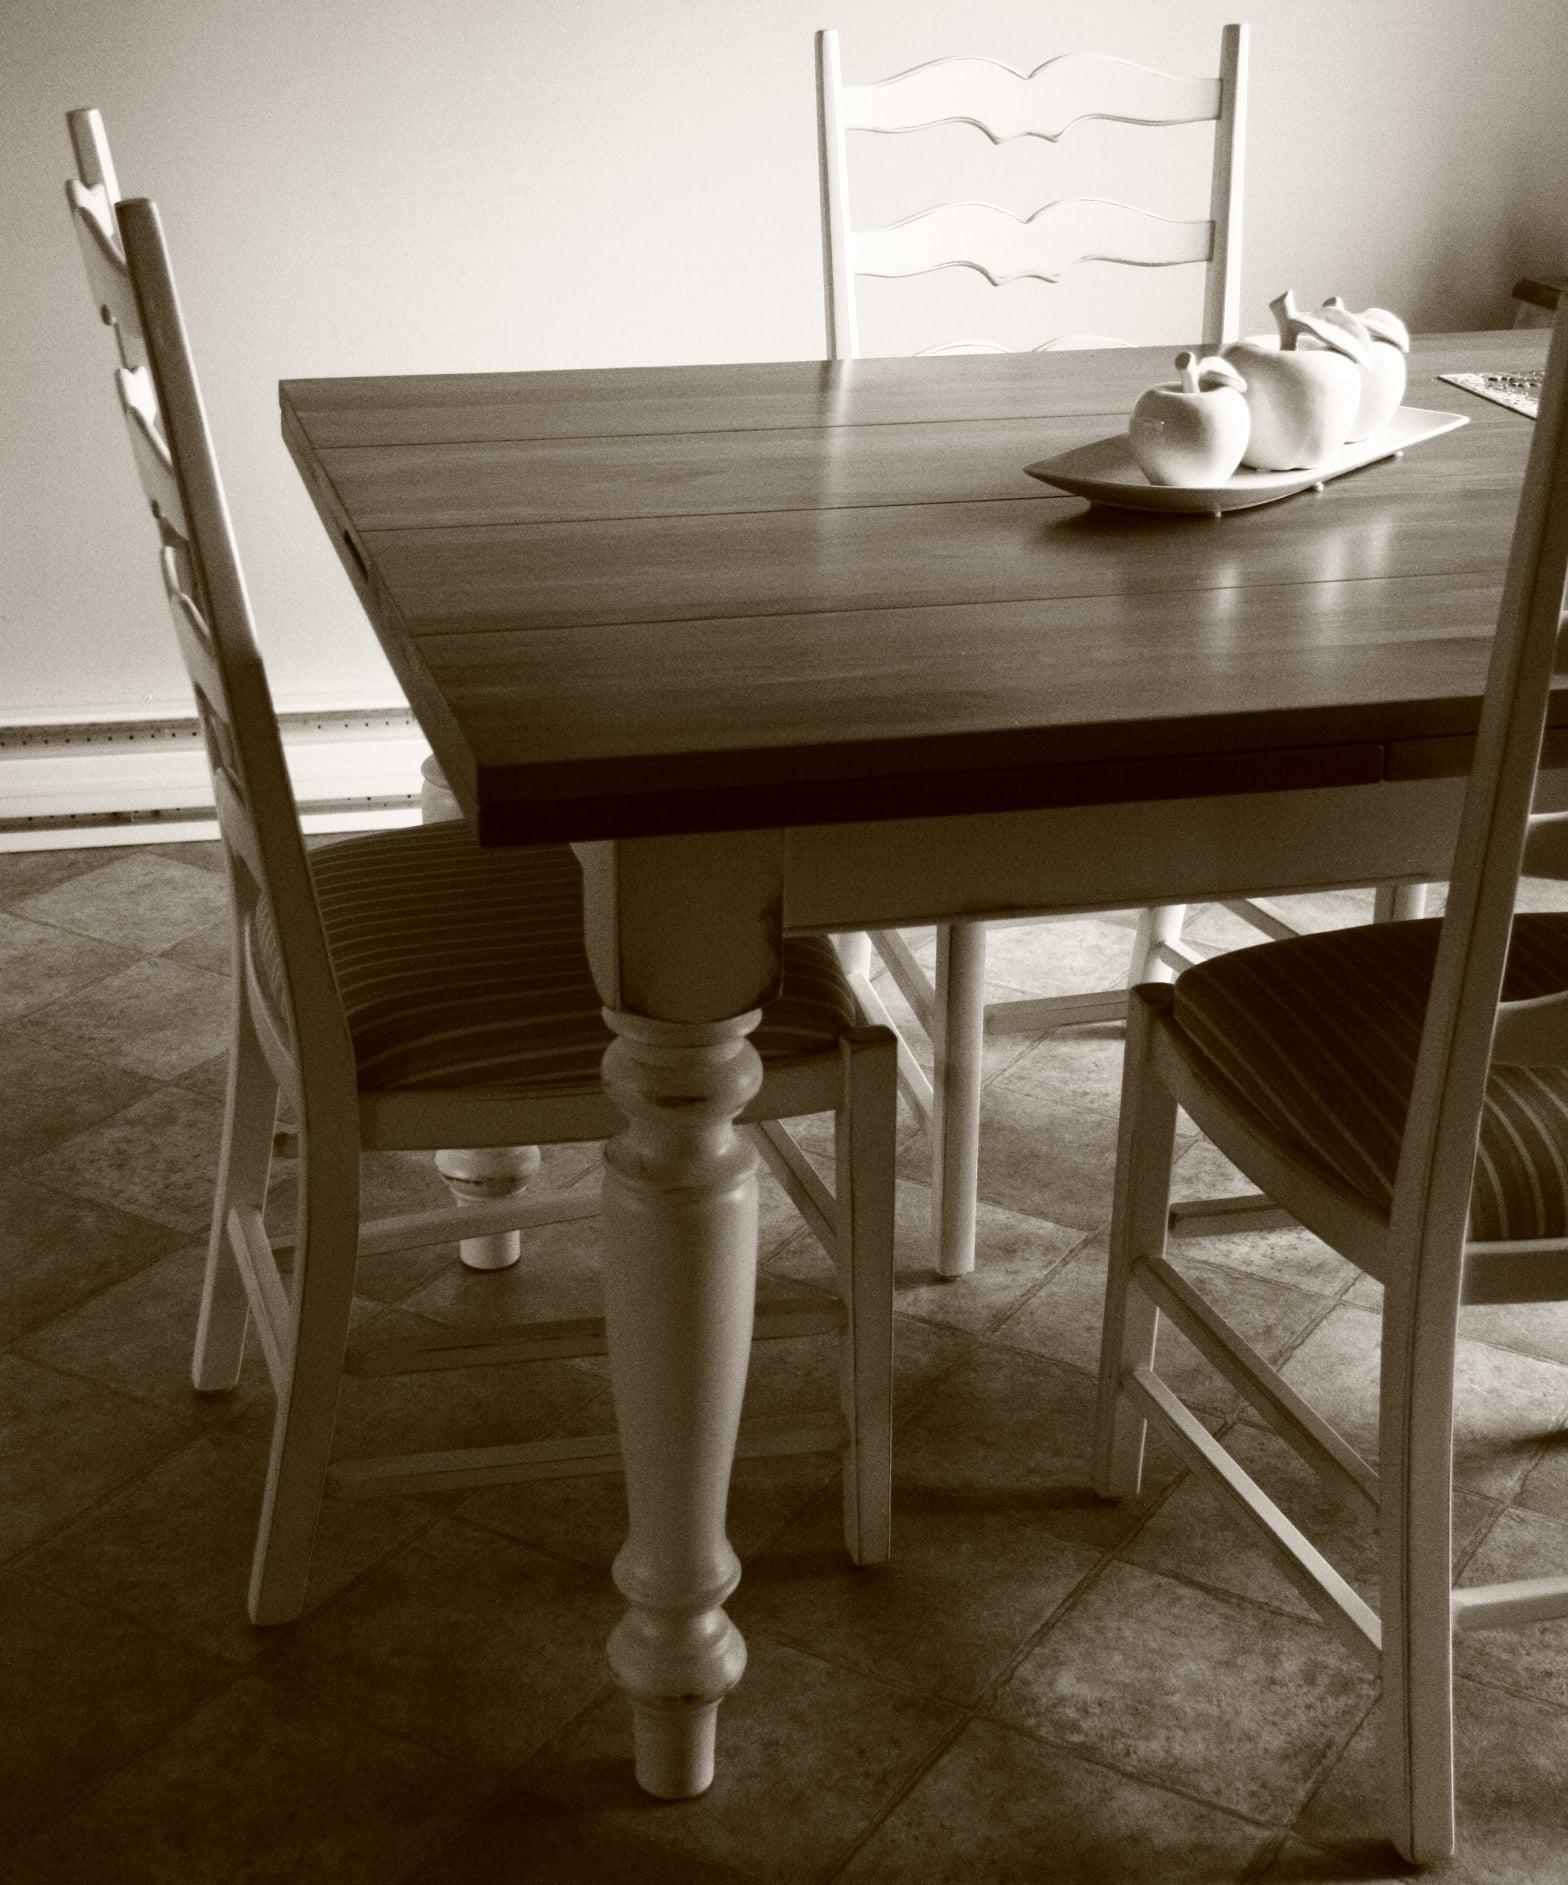 Table la campagnarde meubles sur mesure meubles hochelaga for Meuble hochelaga montreal